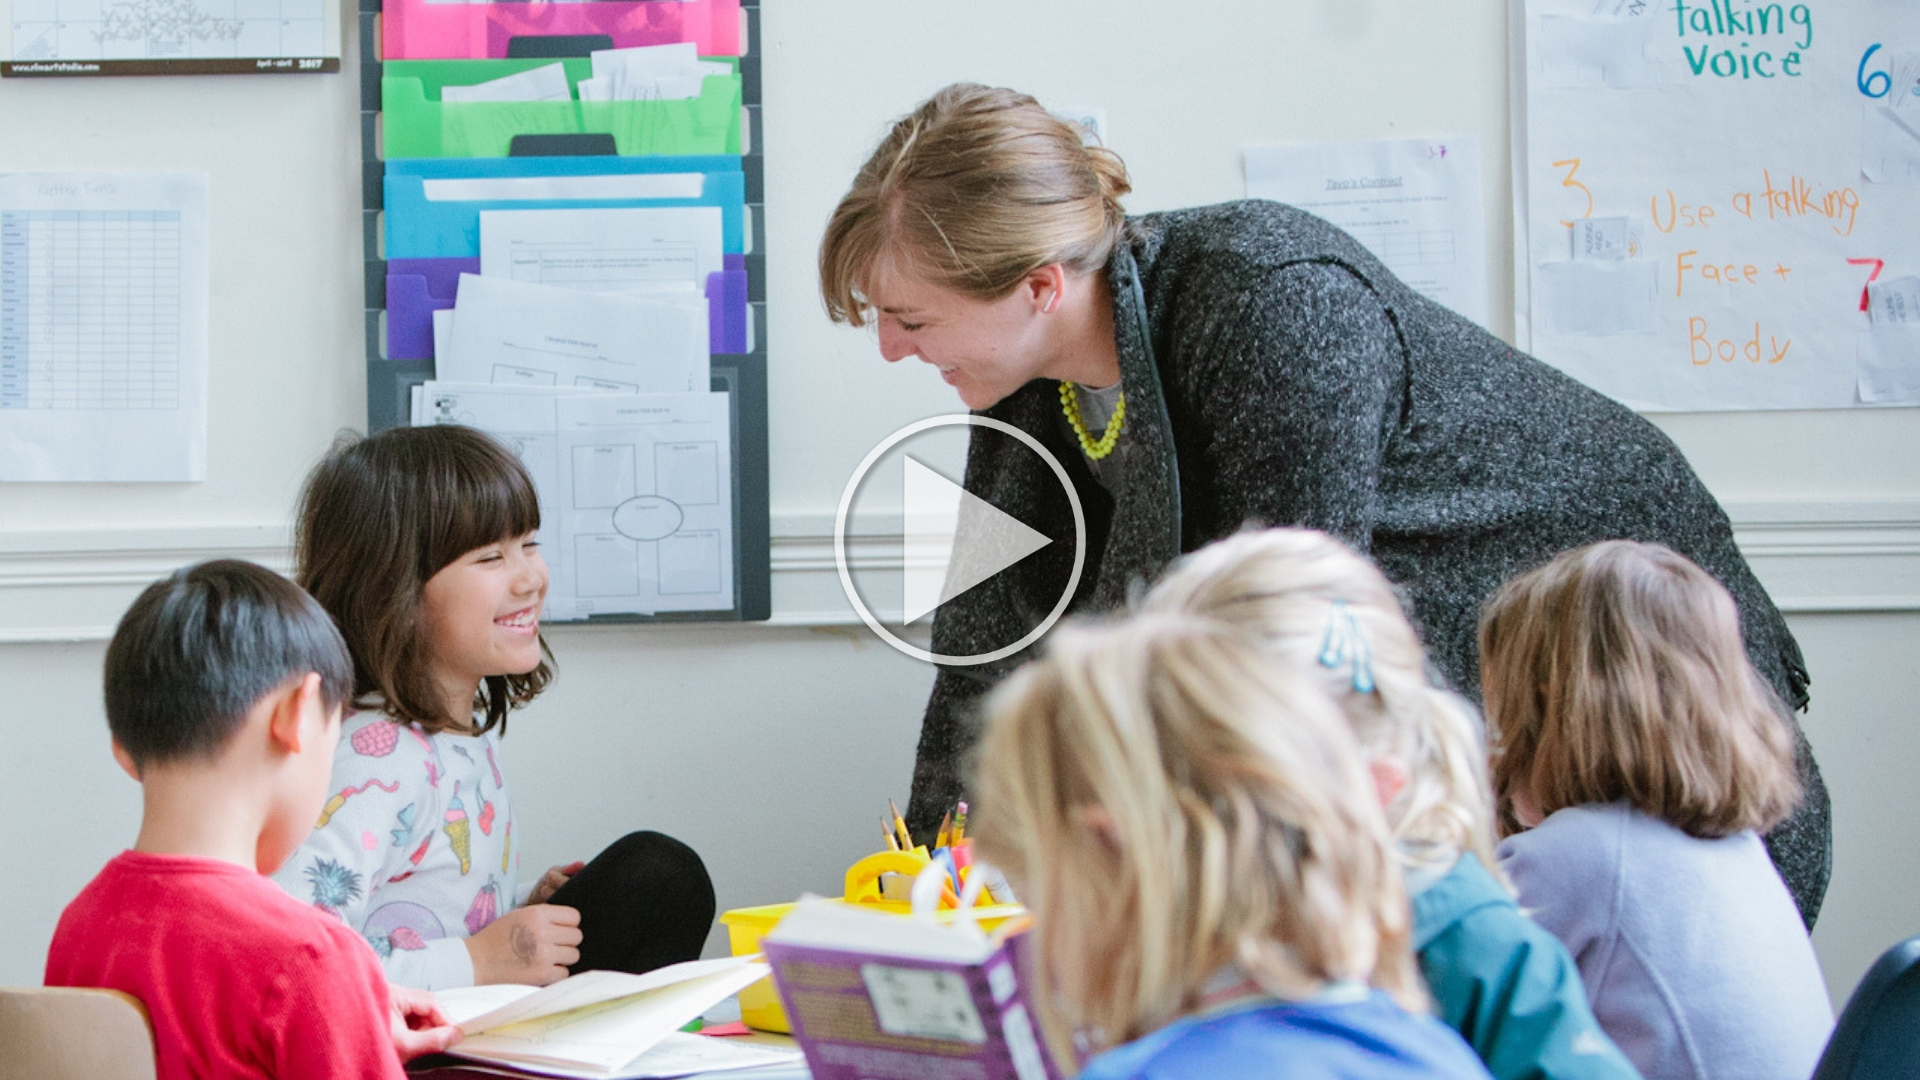 Watch how HEARD helps schools and classrooms